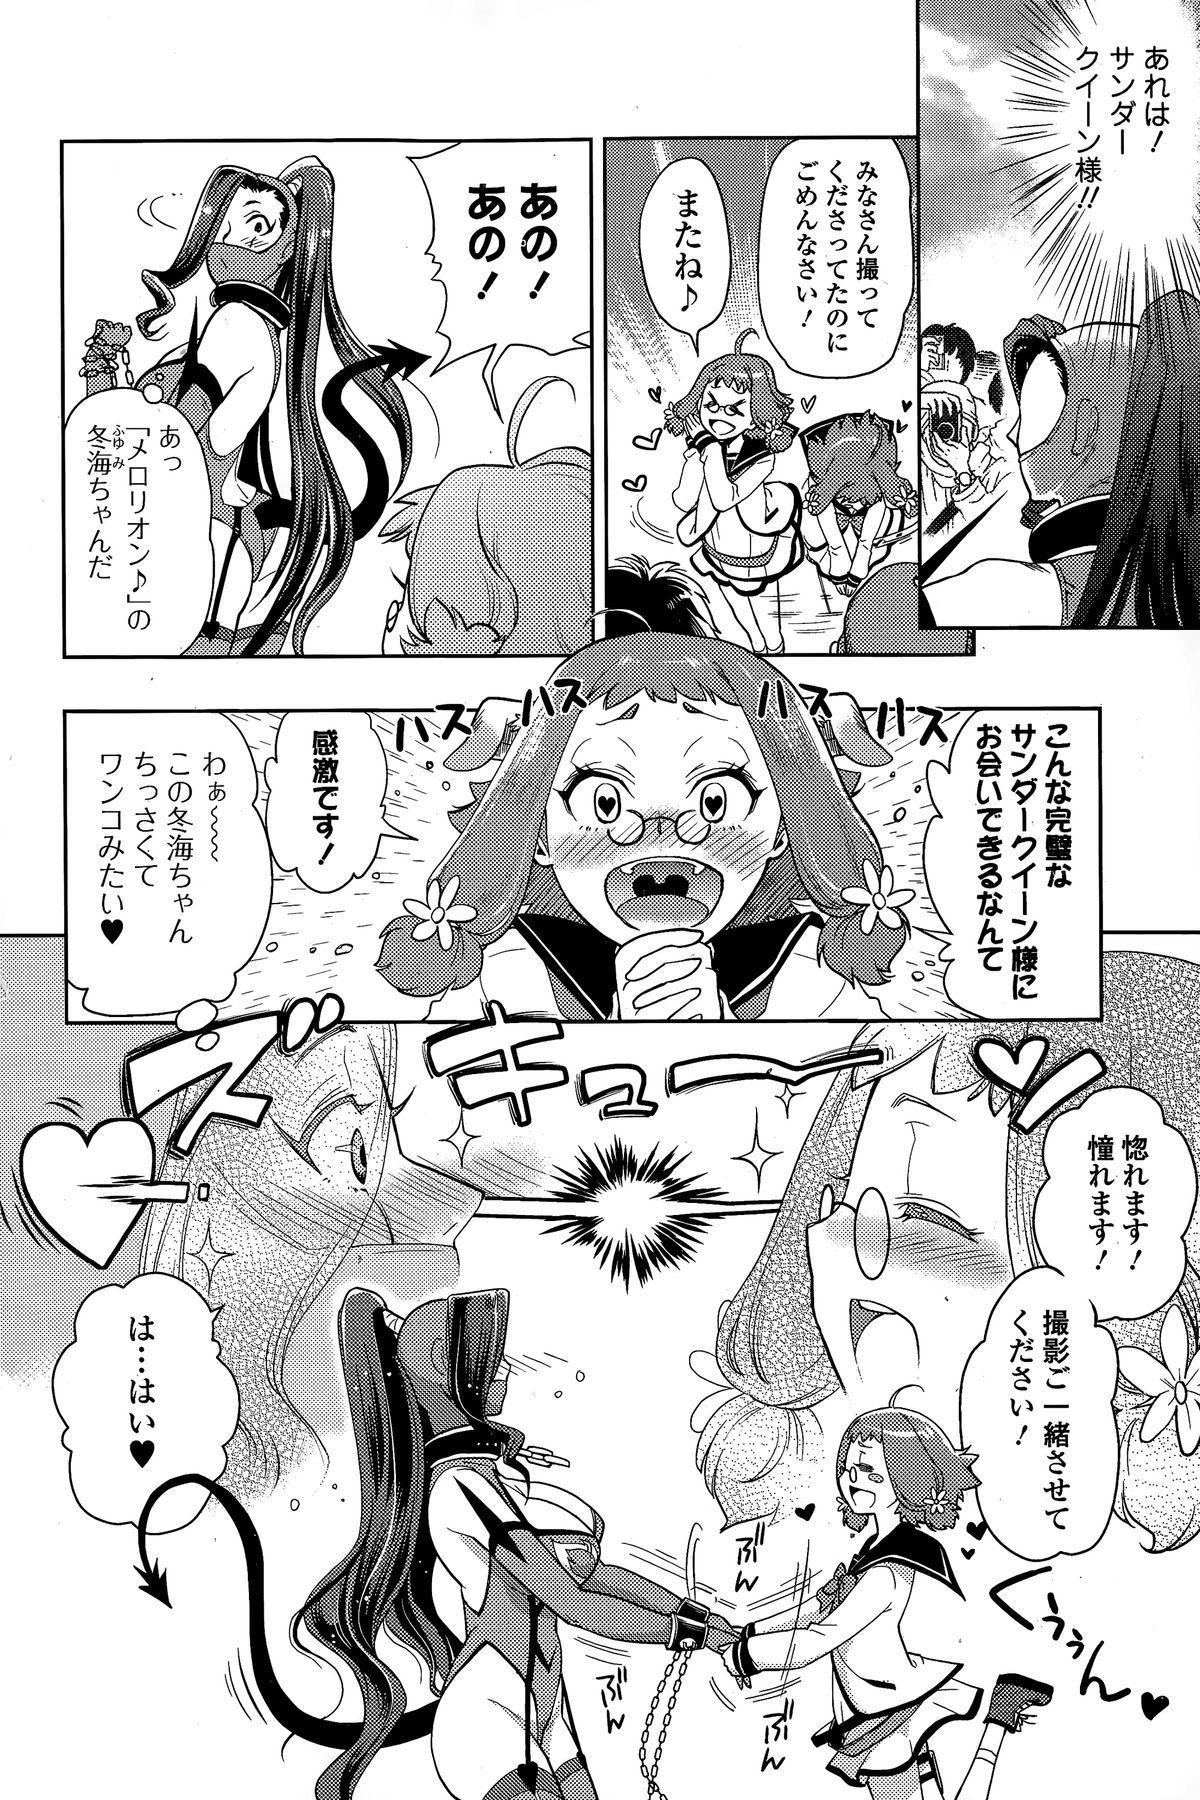 Comic Toutetsu 2015-02 Vol. 3 7